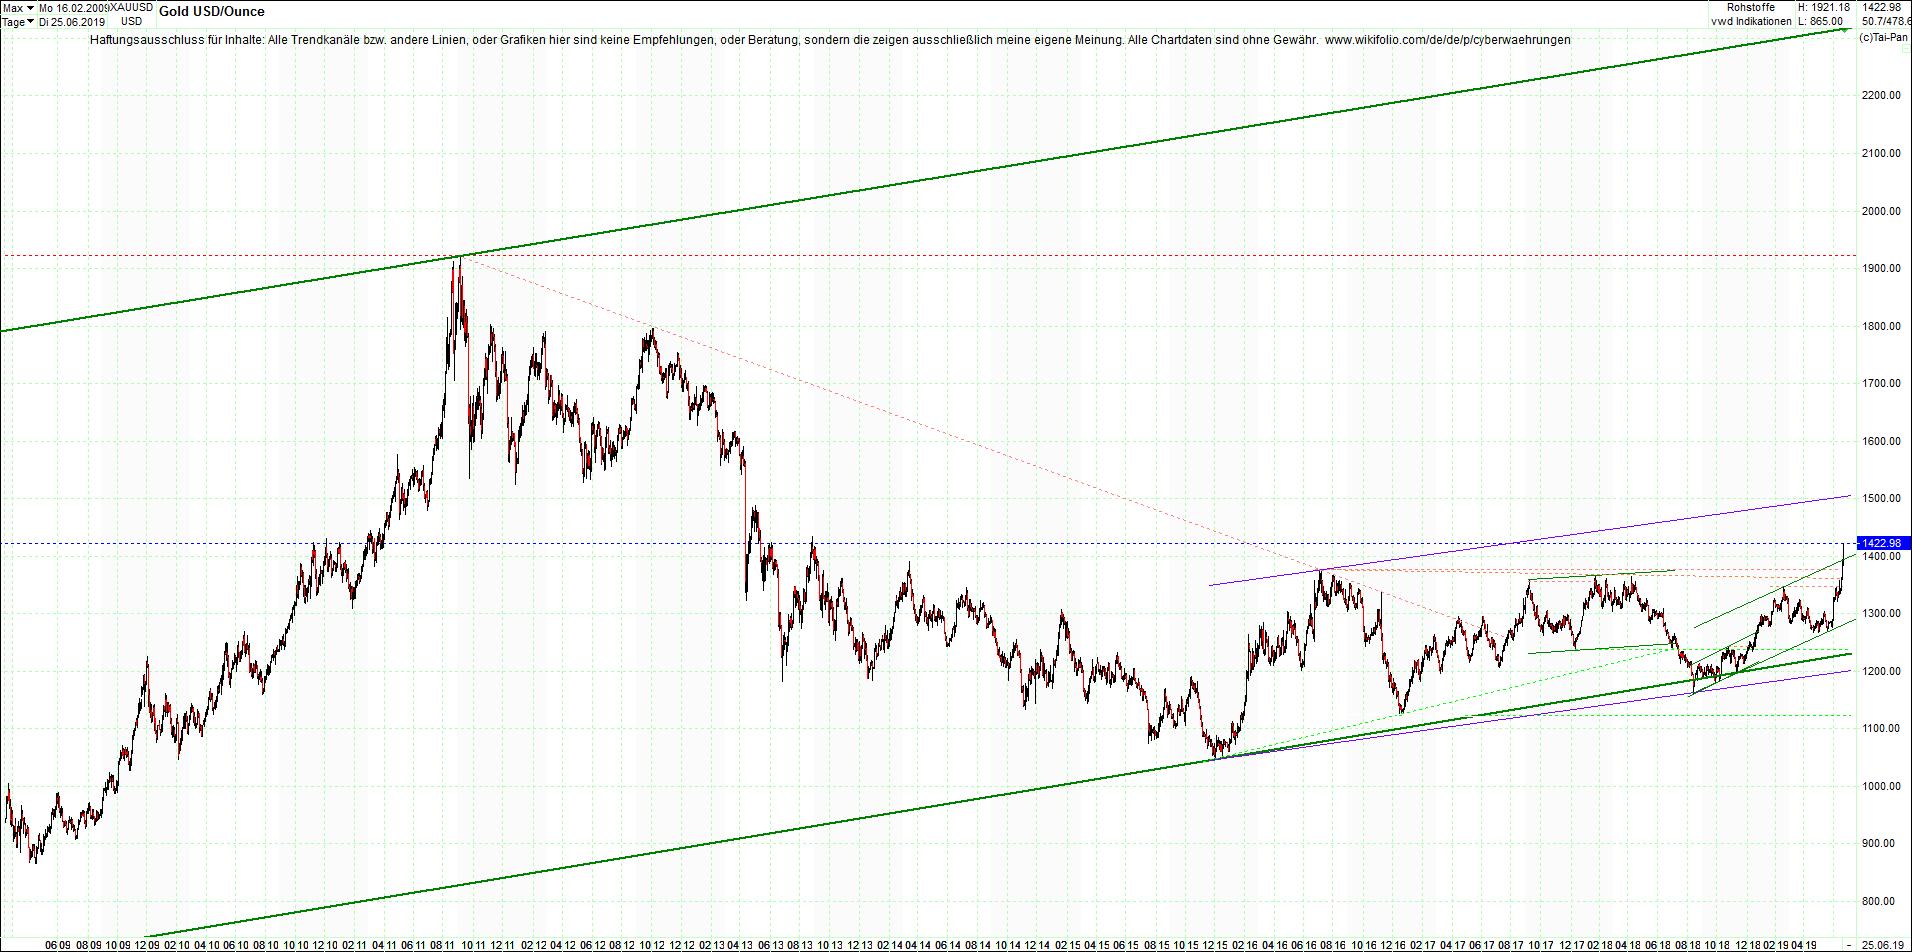 gold_chart_am_abend.png